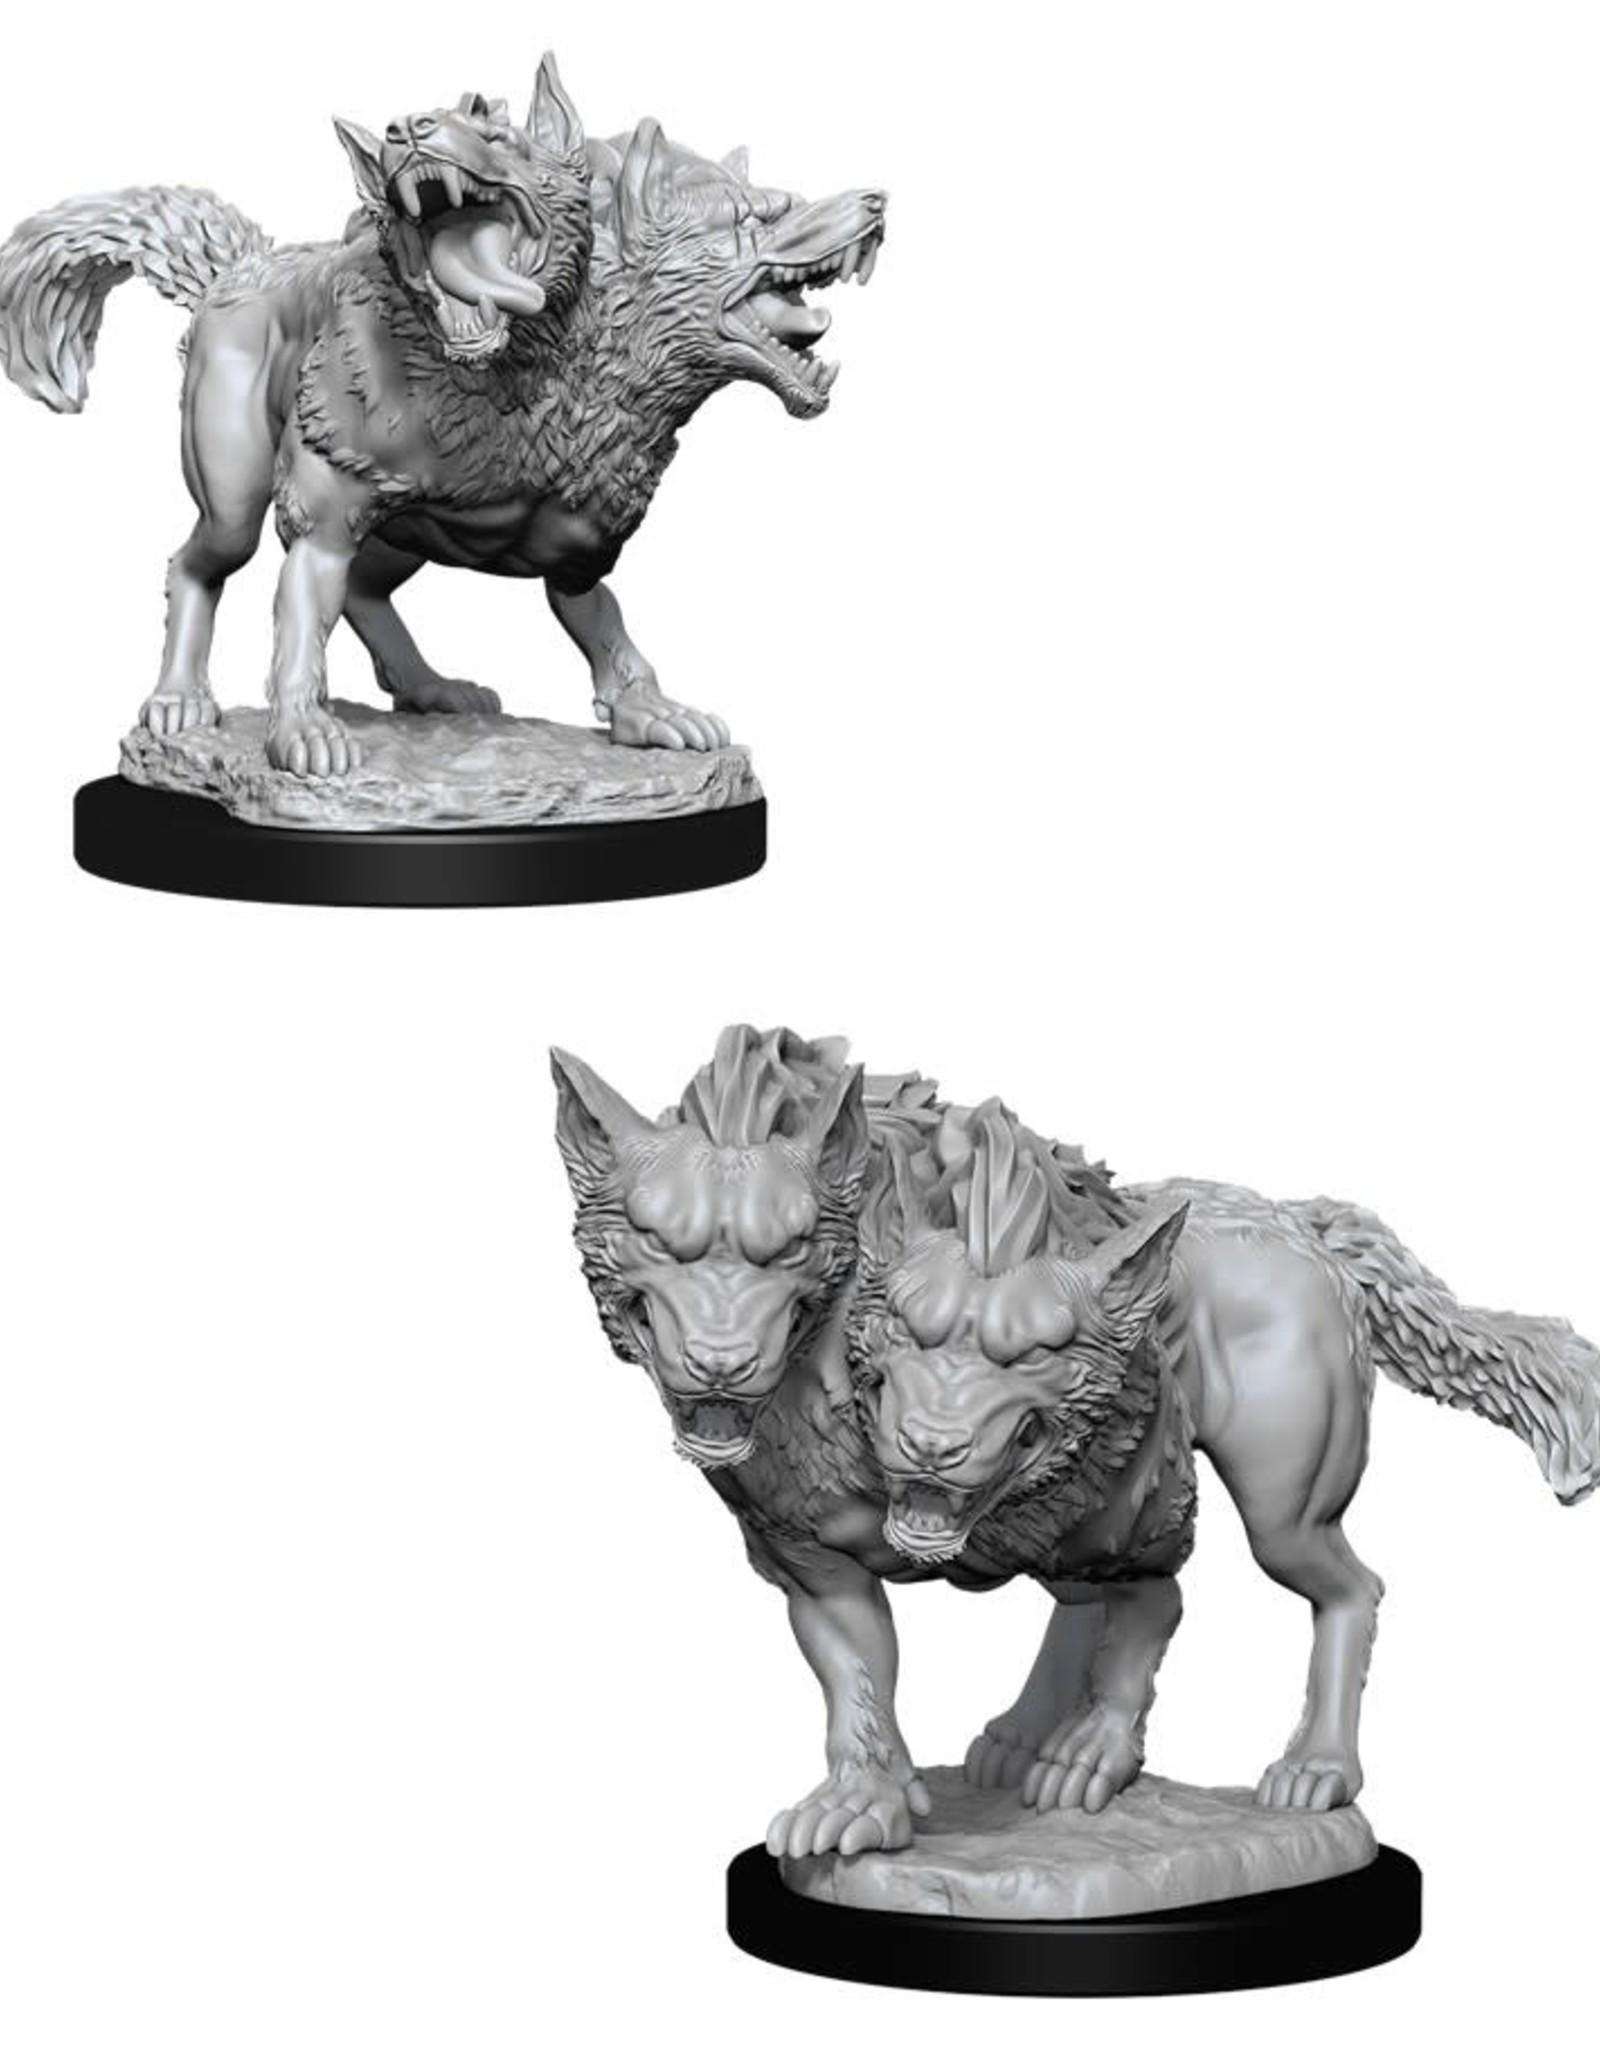 WizKids Dungeons & Dragons Nolzur's Marvelous Miniatures: Death Dog